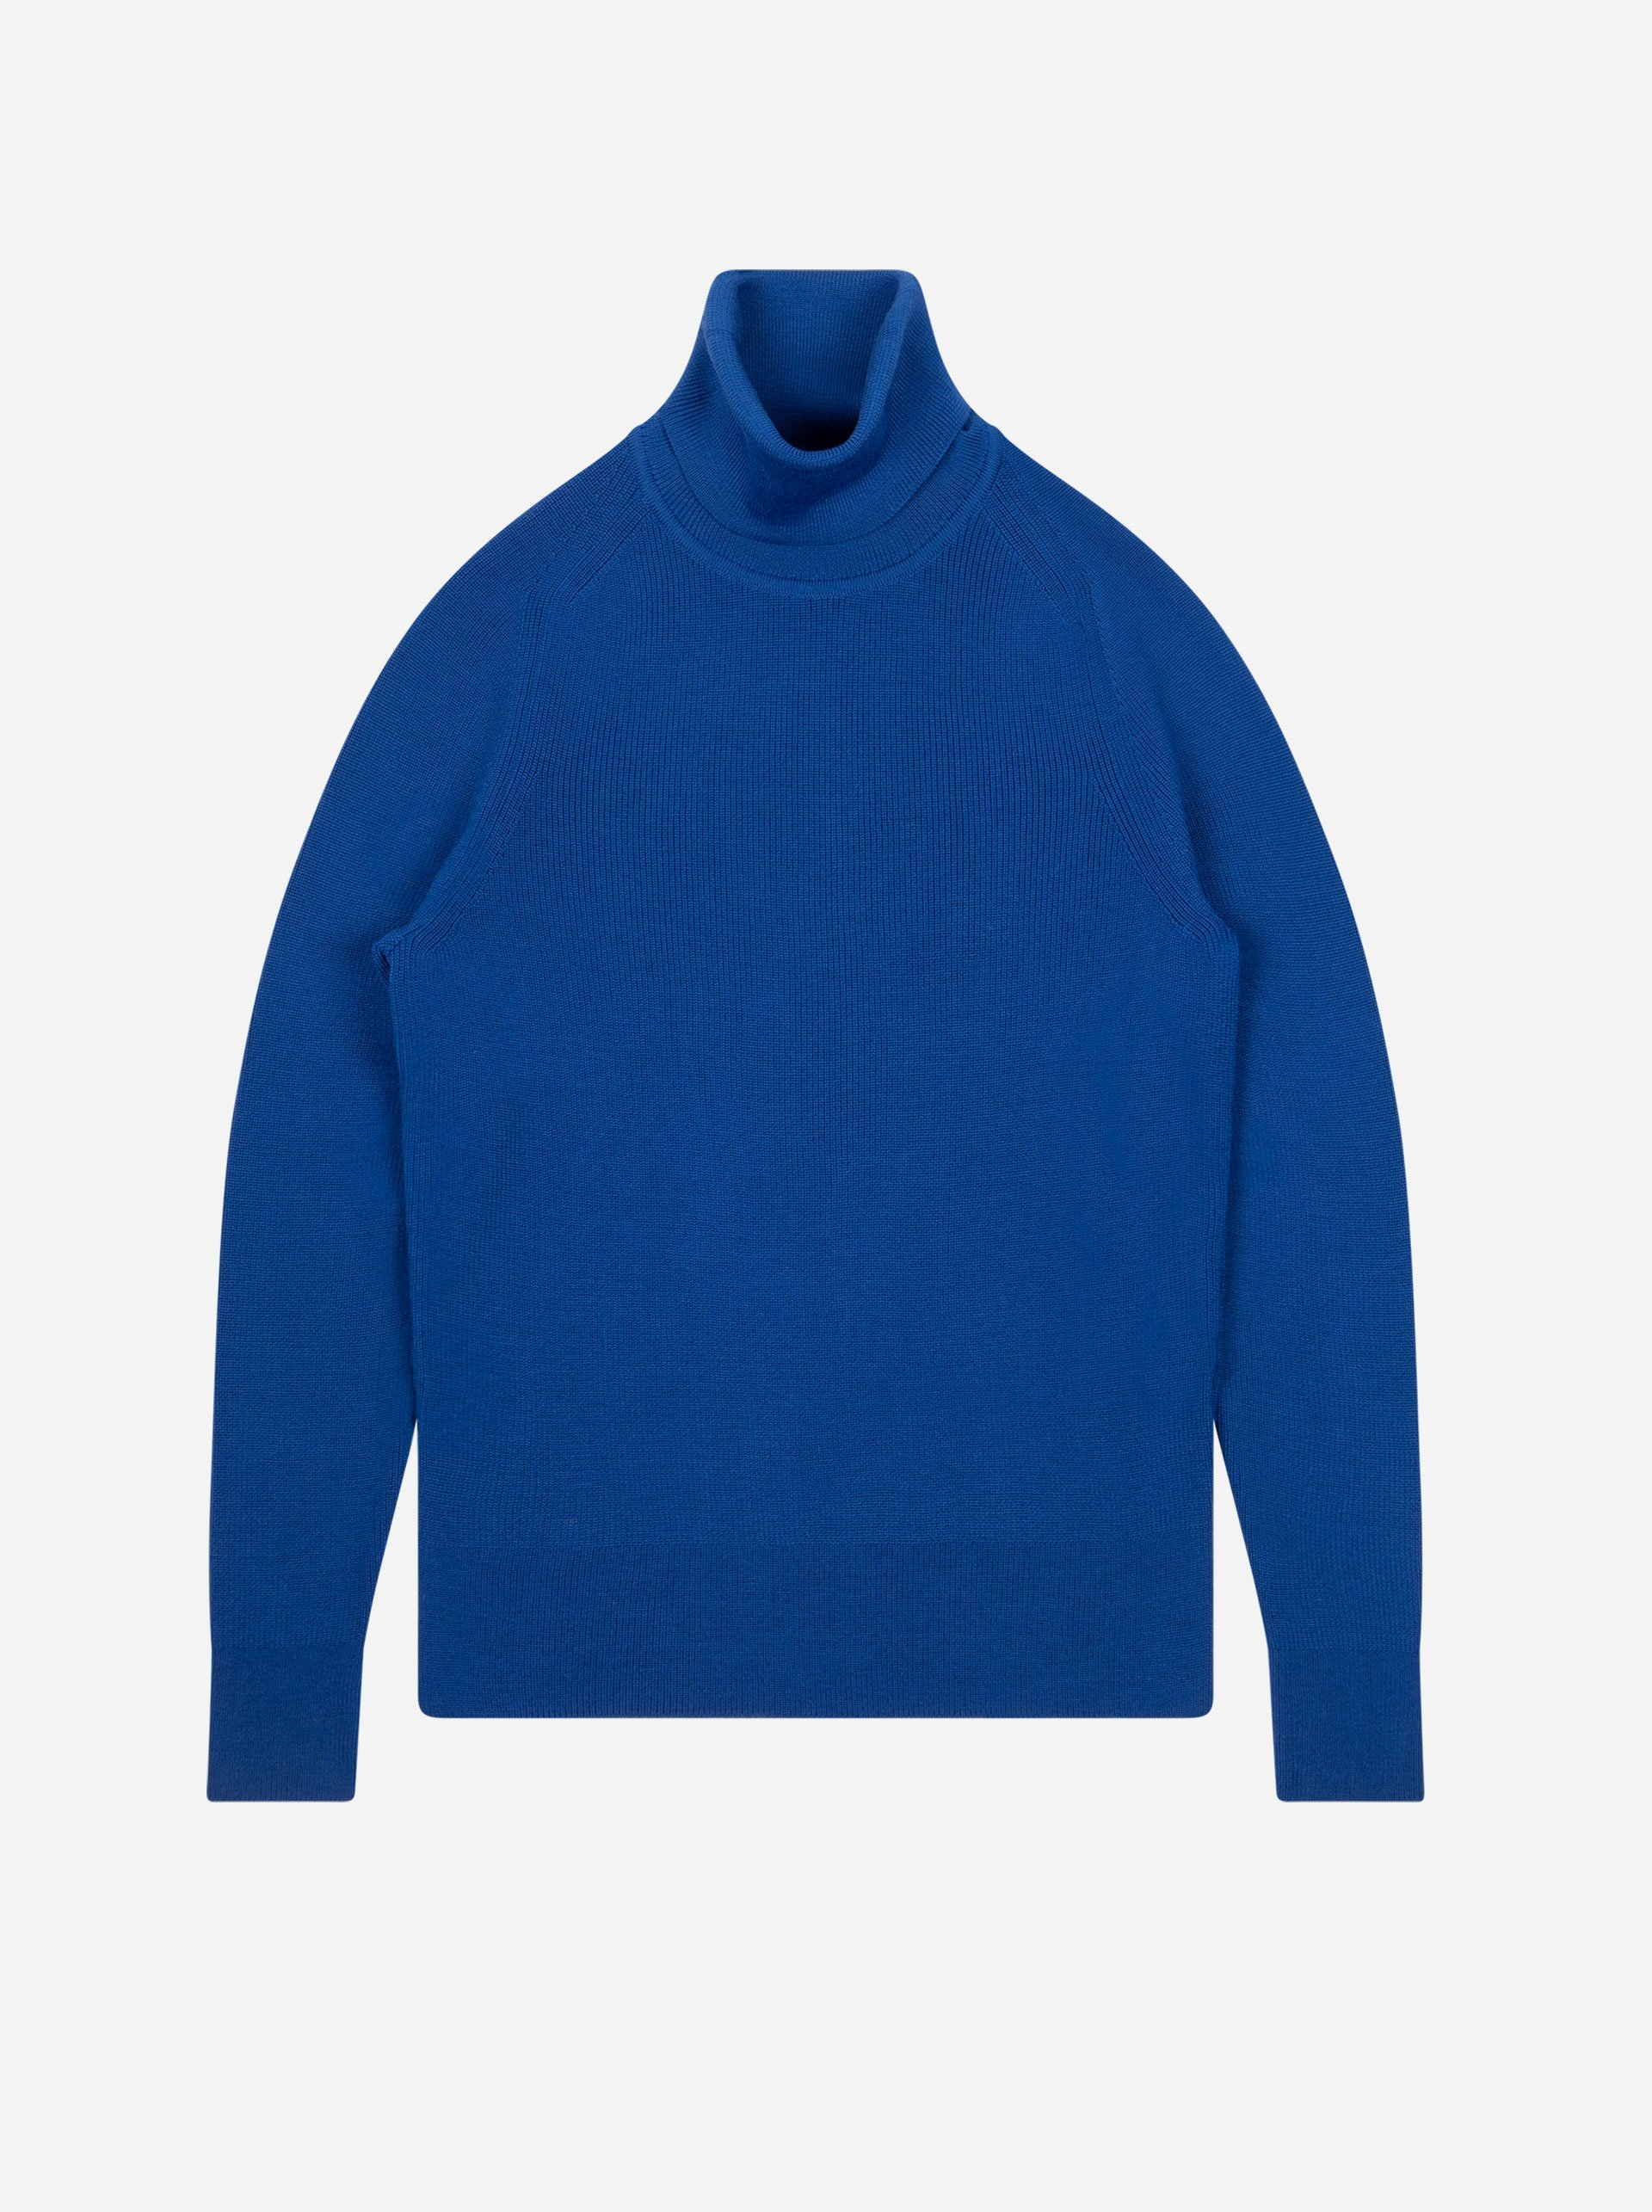 Teym - Turtleneck - The Merino Sweater - Women - Cobalt - 4